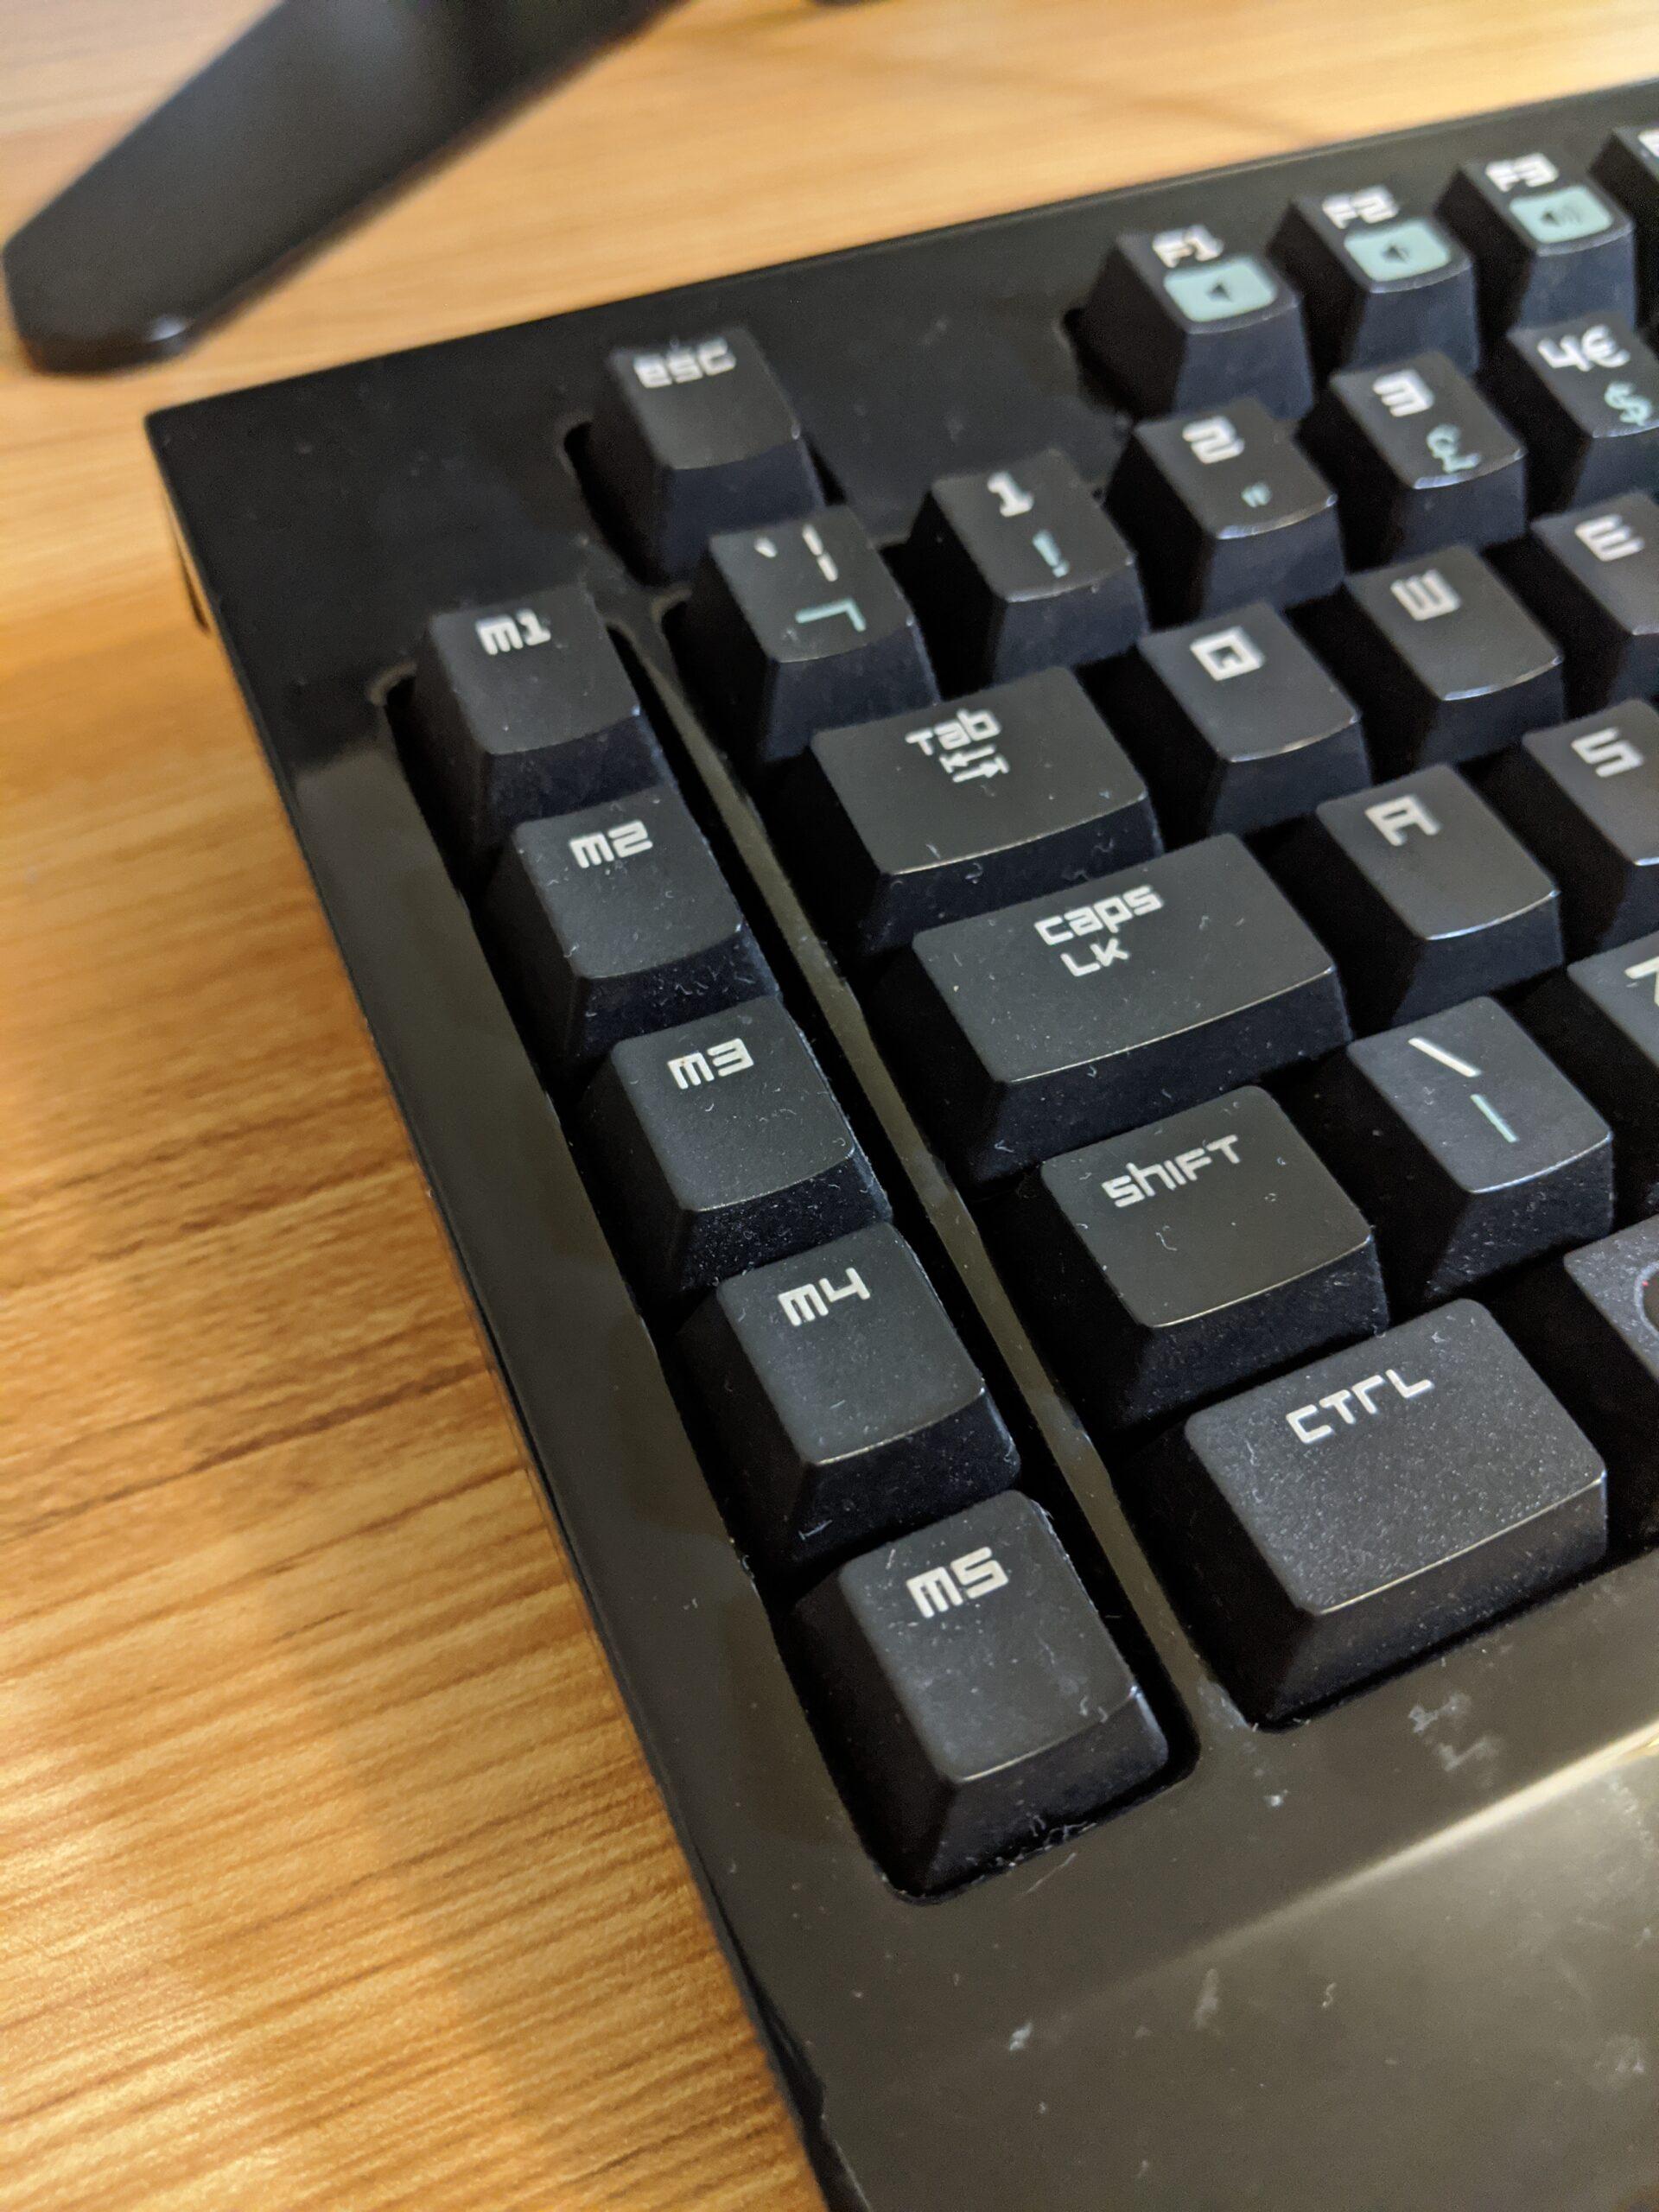 Razer BlackWidow Macro keys